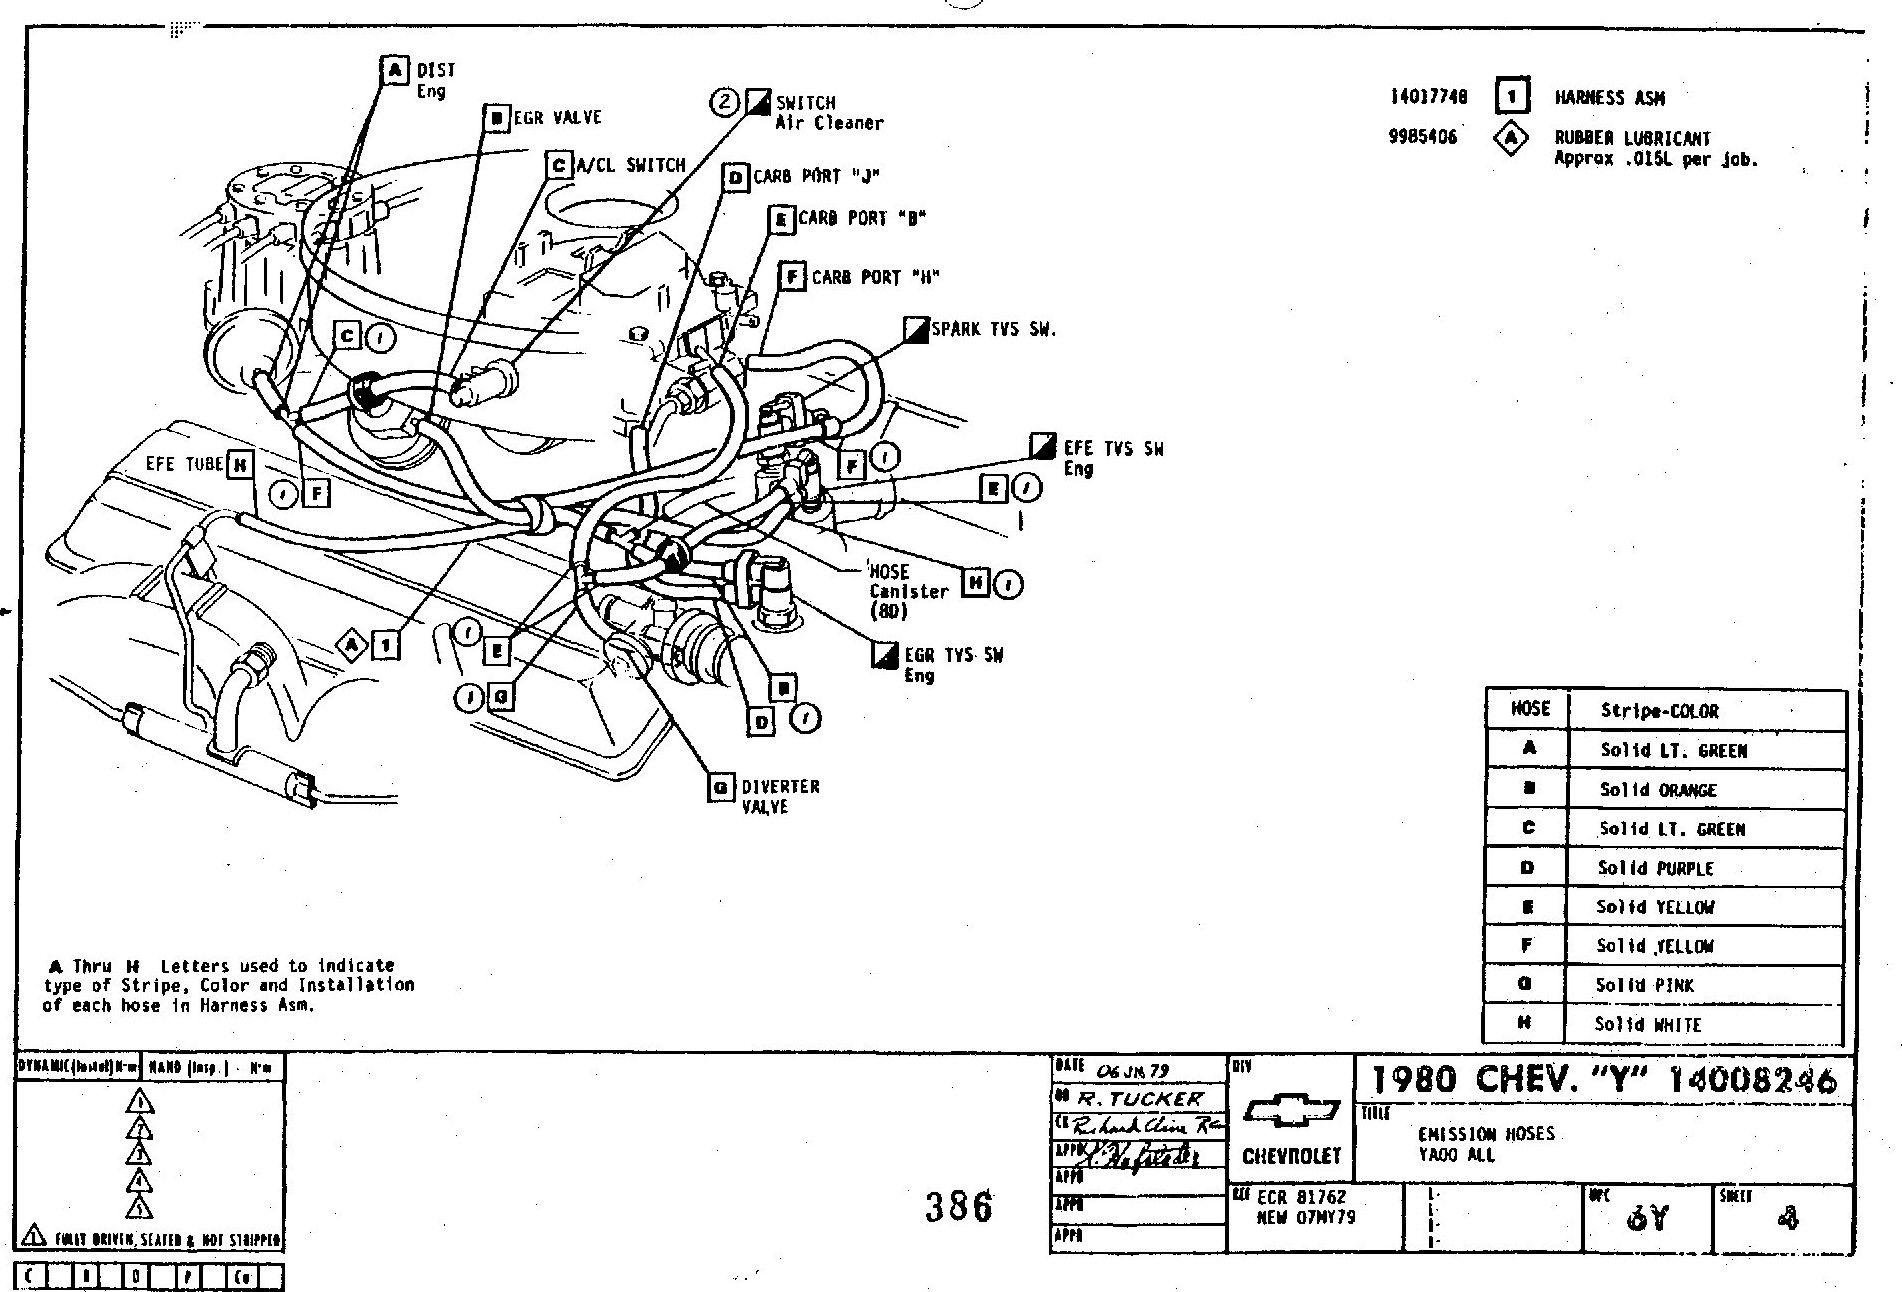 1982 corvette wiring diagram 2001 nissan frontier engine l82 auto